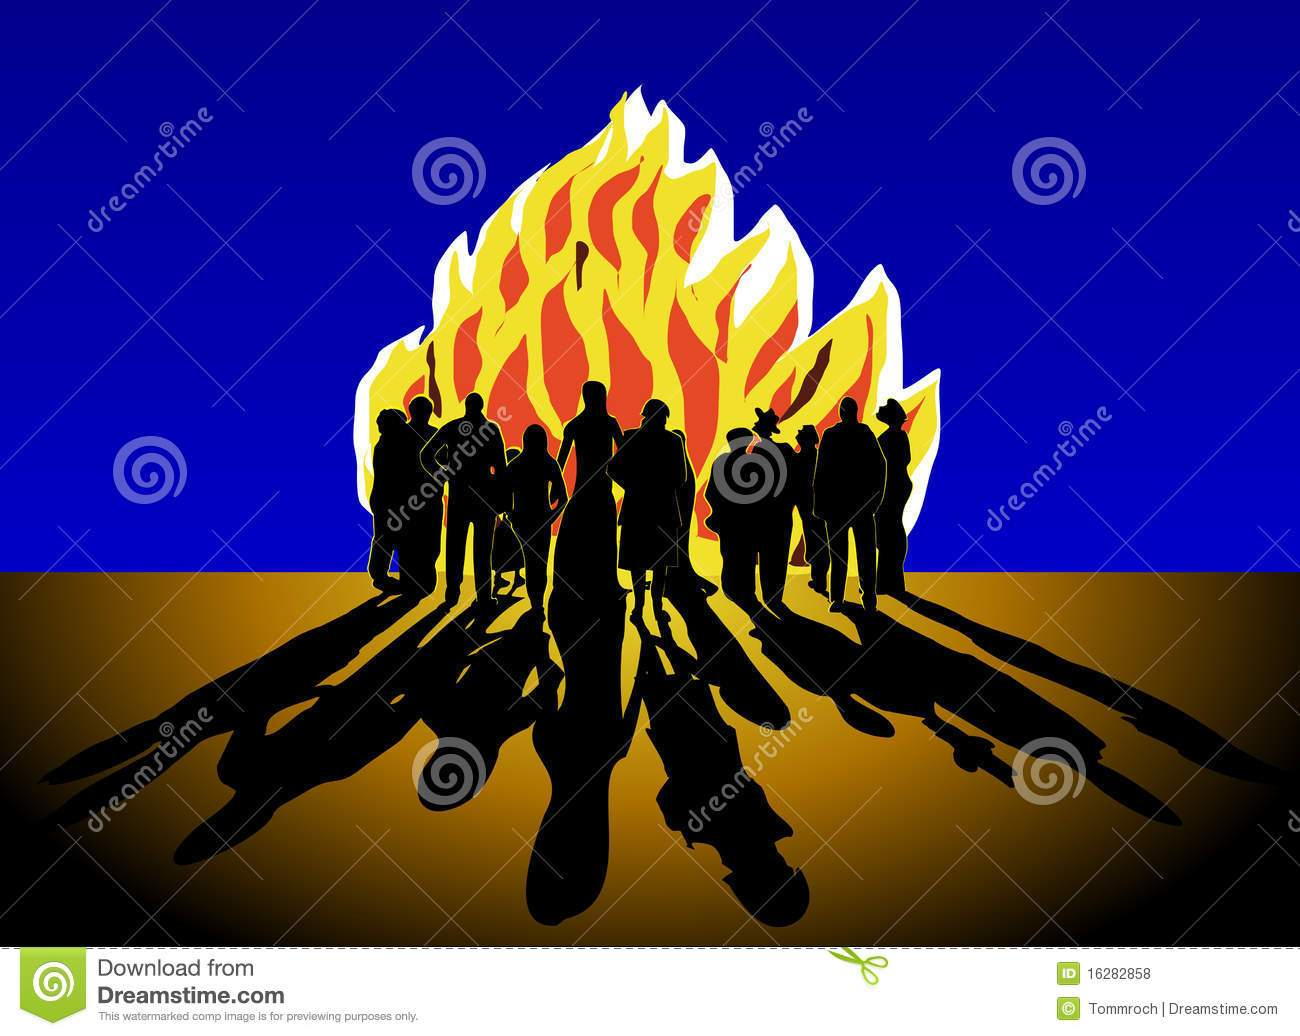 Bonfire party clipart 7 » Clipart Portal.